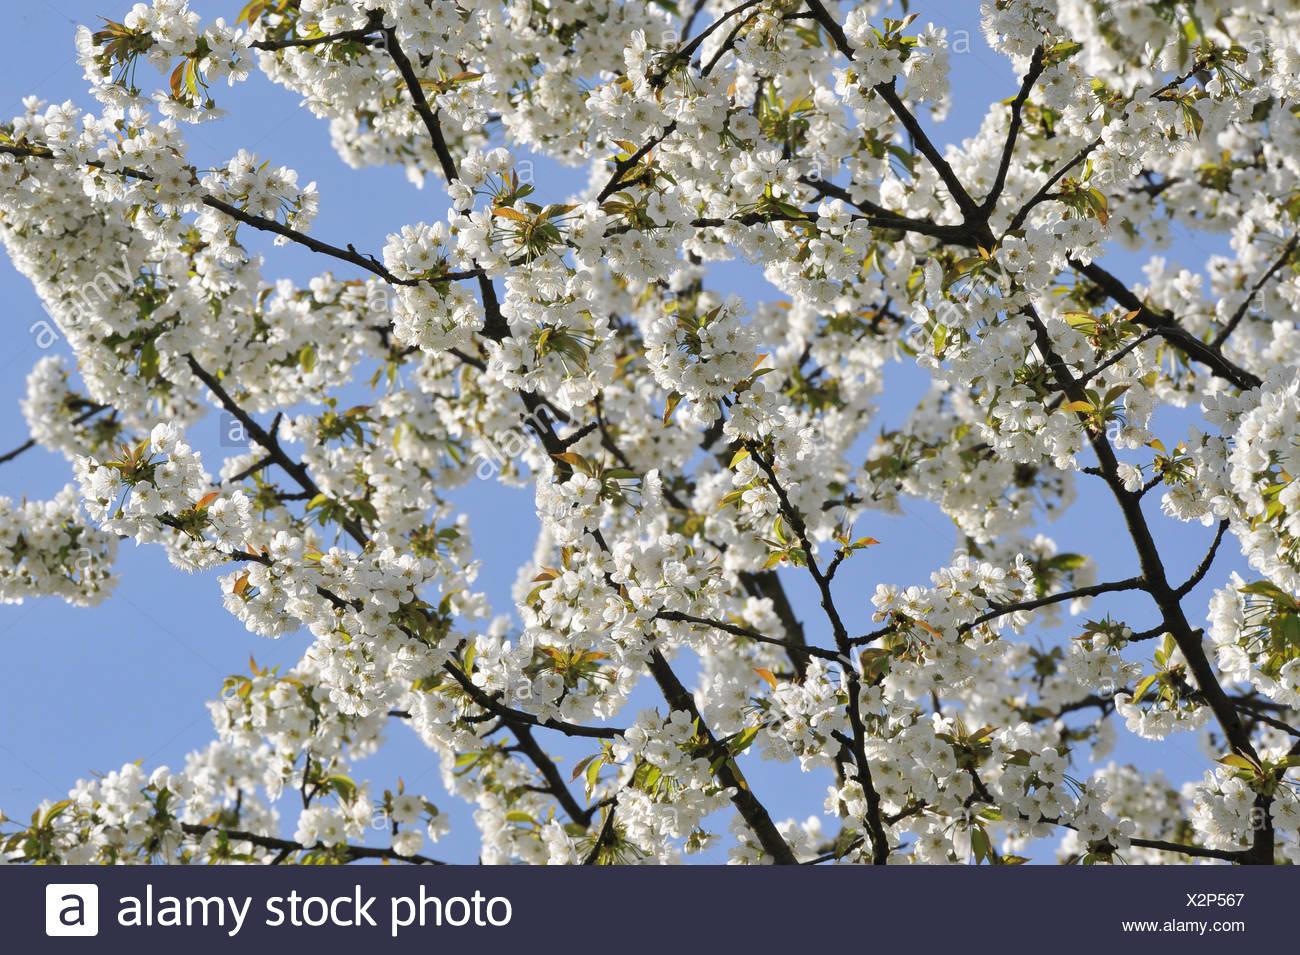 Tree, blossoms, flourishes, fruit-tree, white, cherry tree blossoms, prunus avium - Stock Image